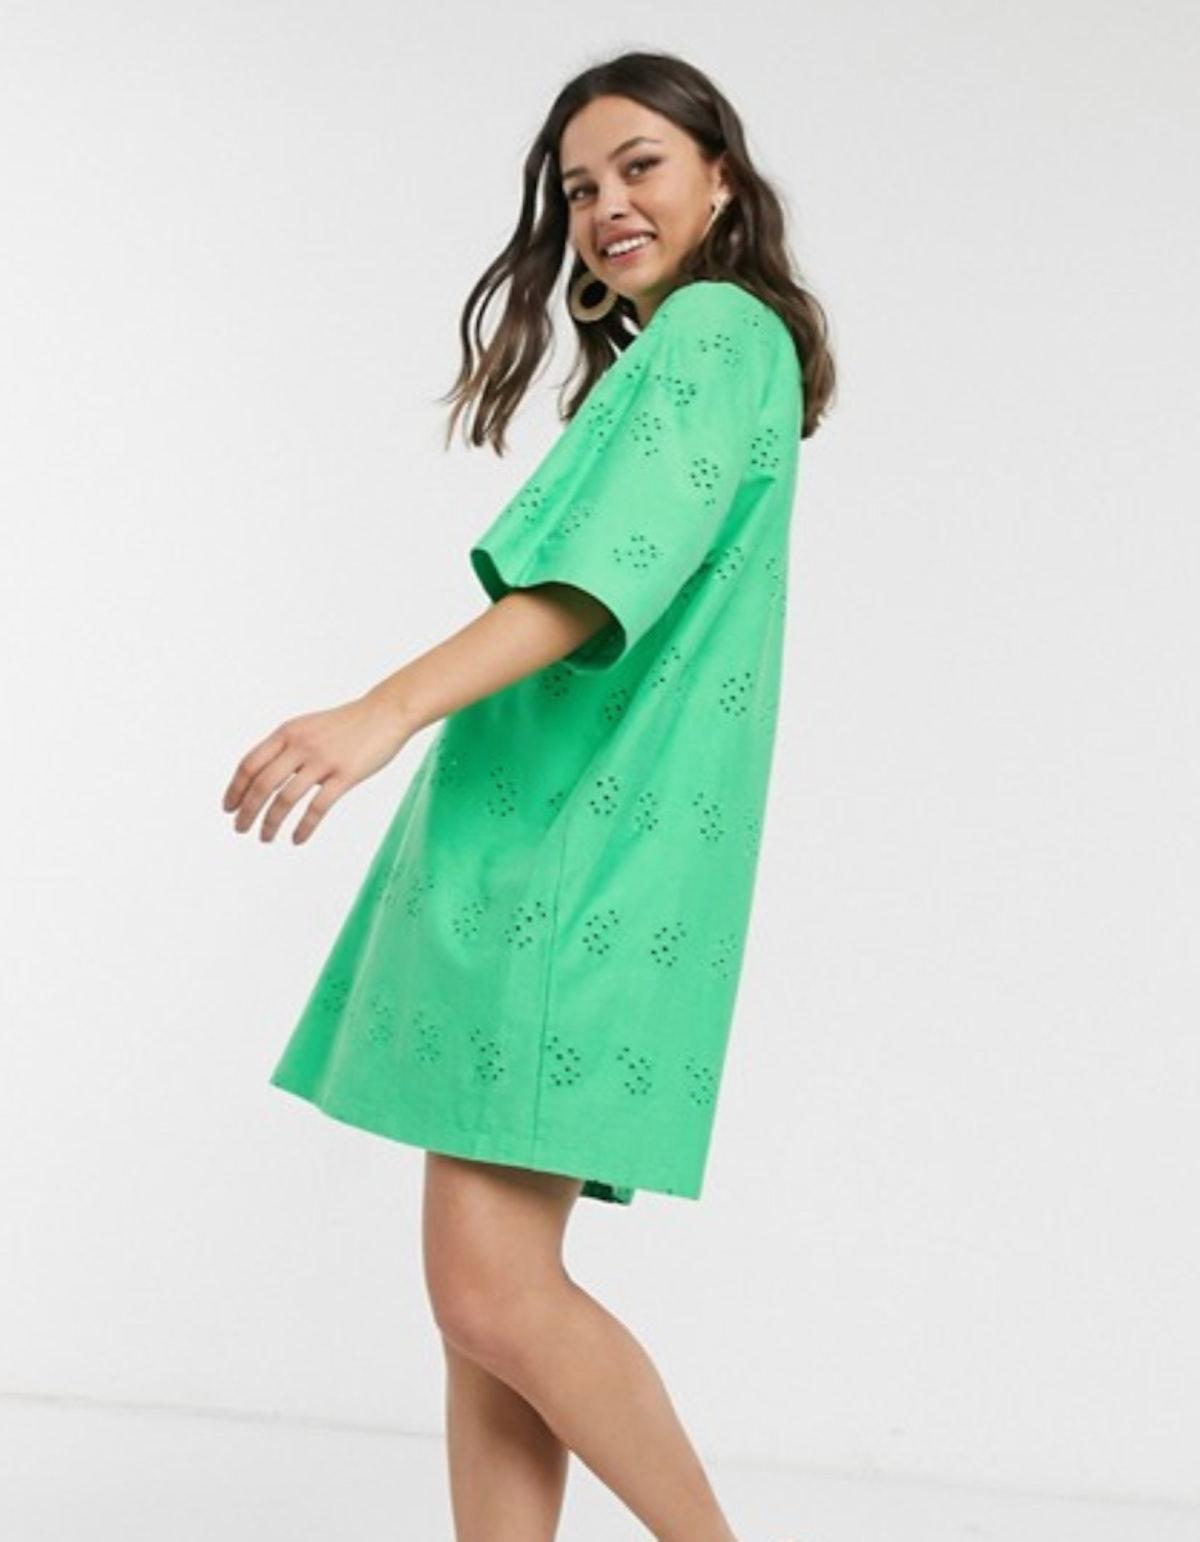 ASOS DESIGN Broderie Super Oversized T-shirt Dress in Green